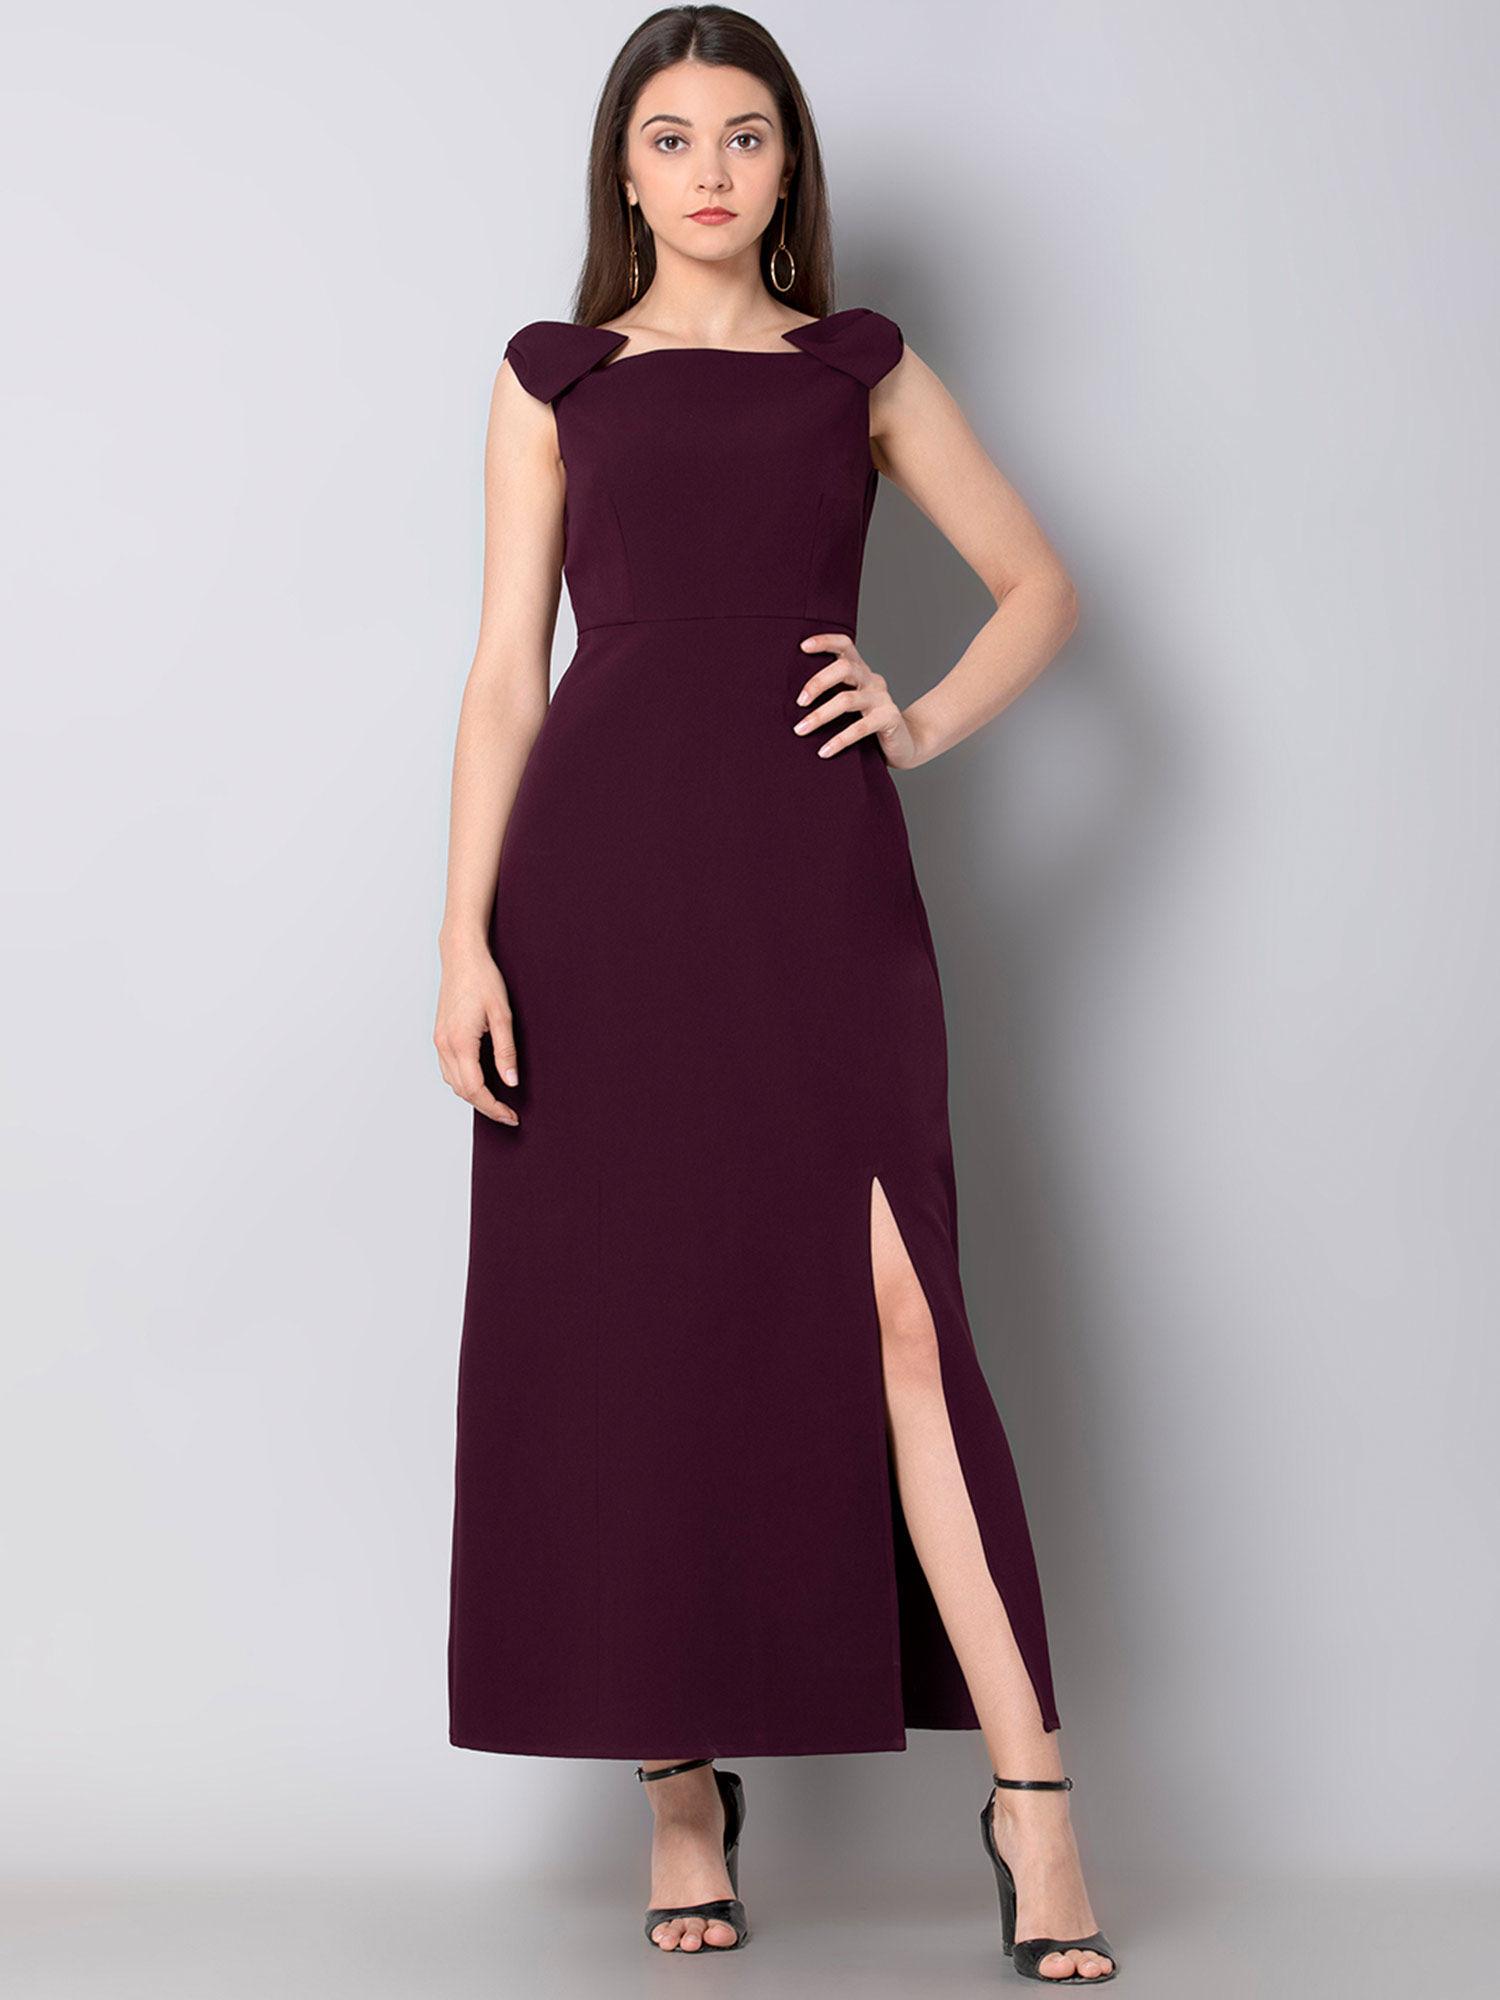 party wear stylish dress for girls